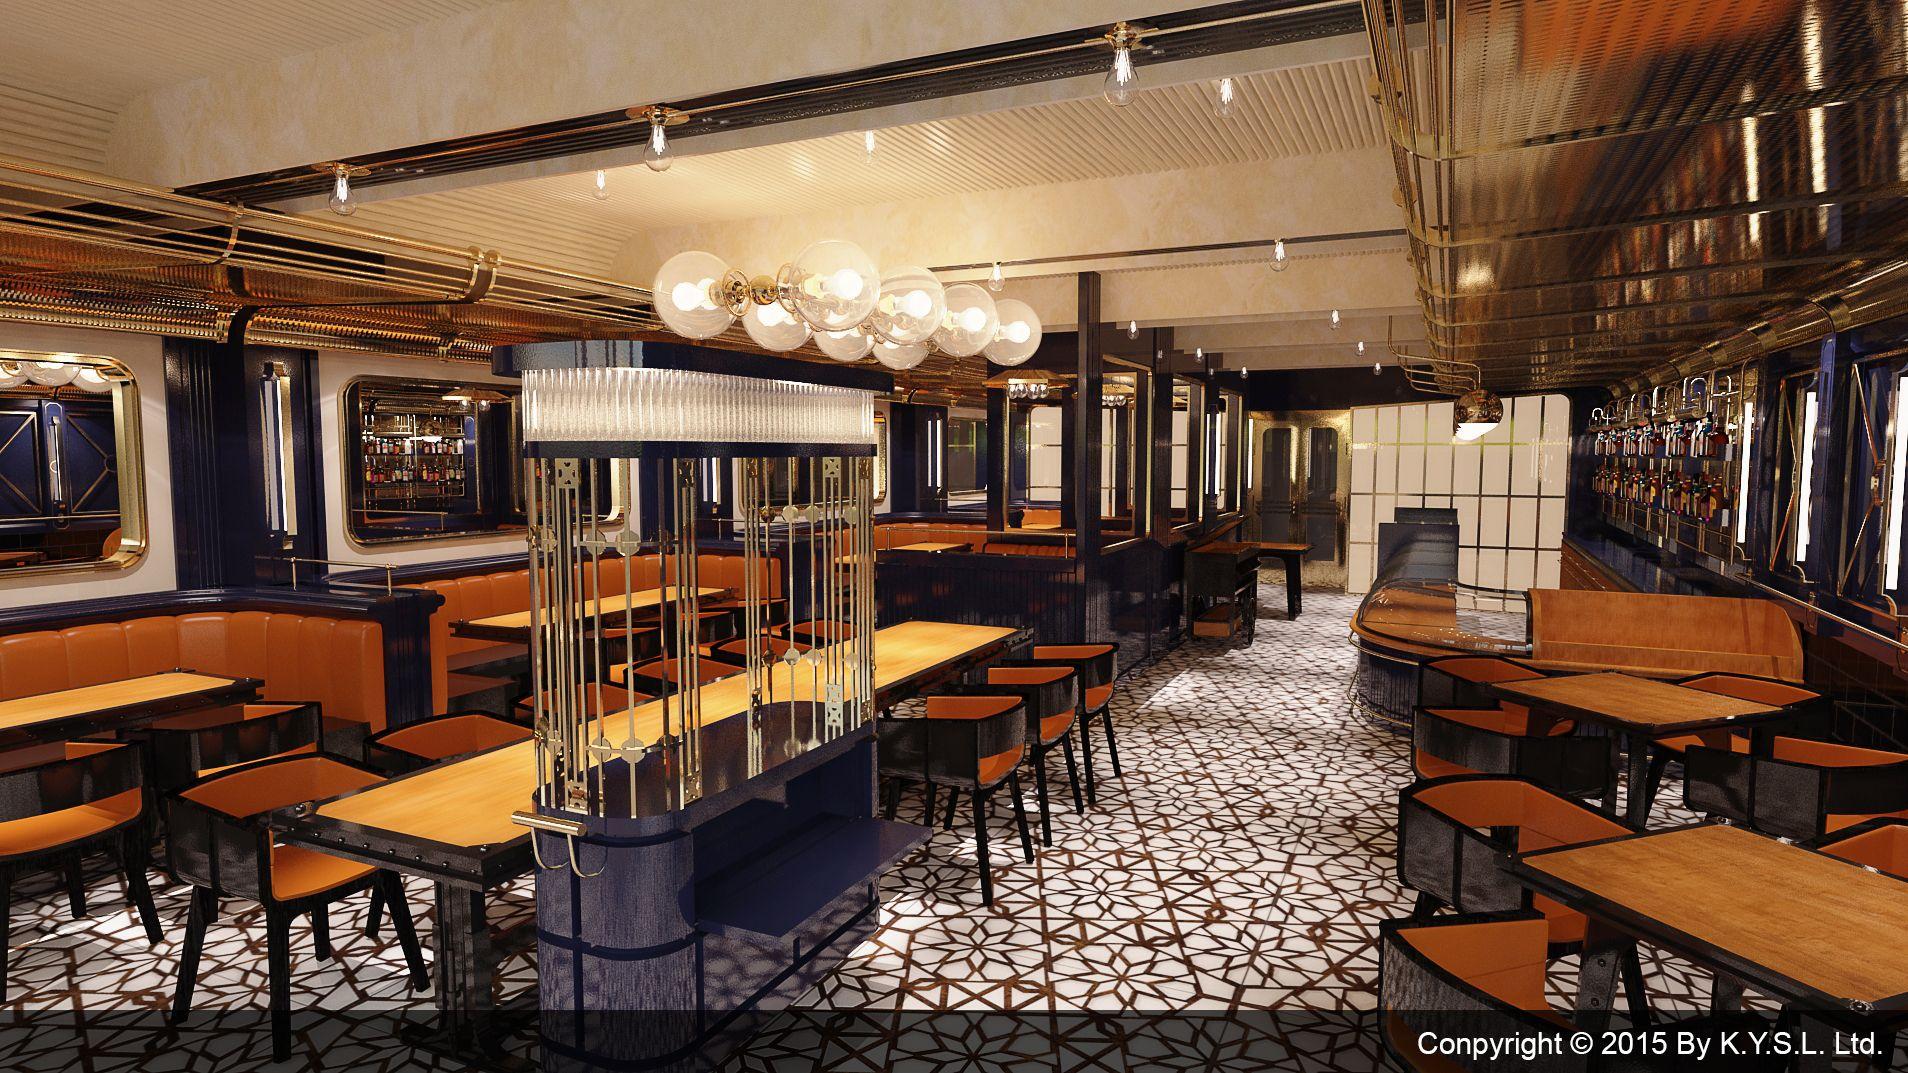 platform 8 designed by k y s l ltd an art deco restaurant bar